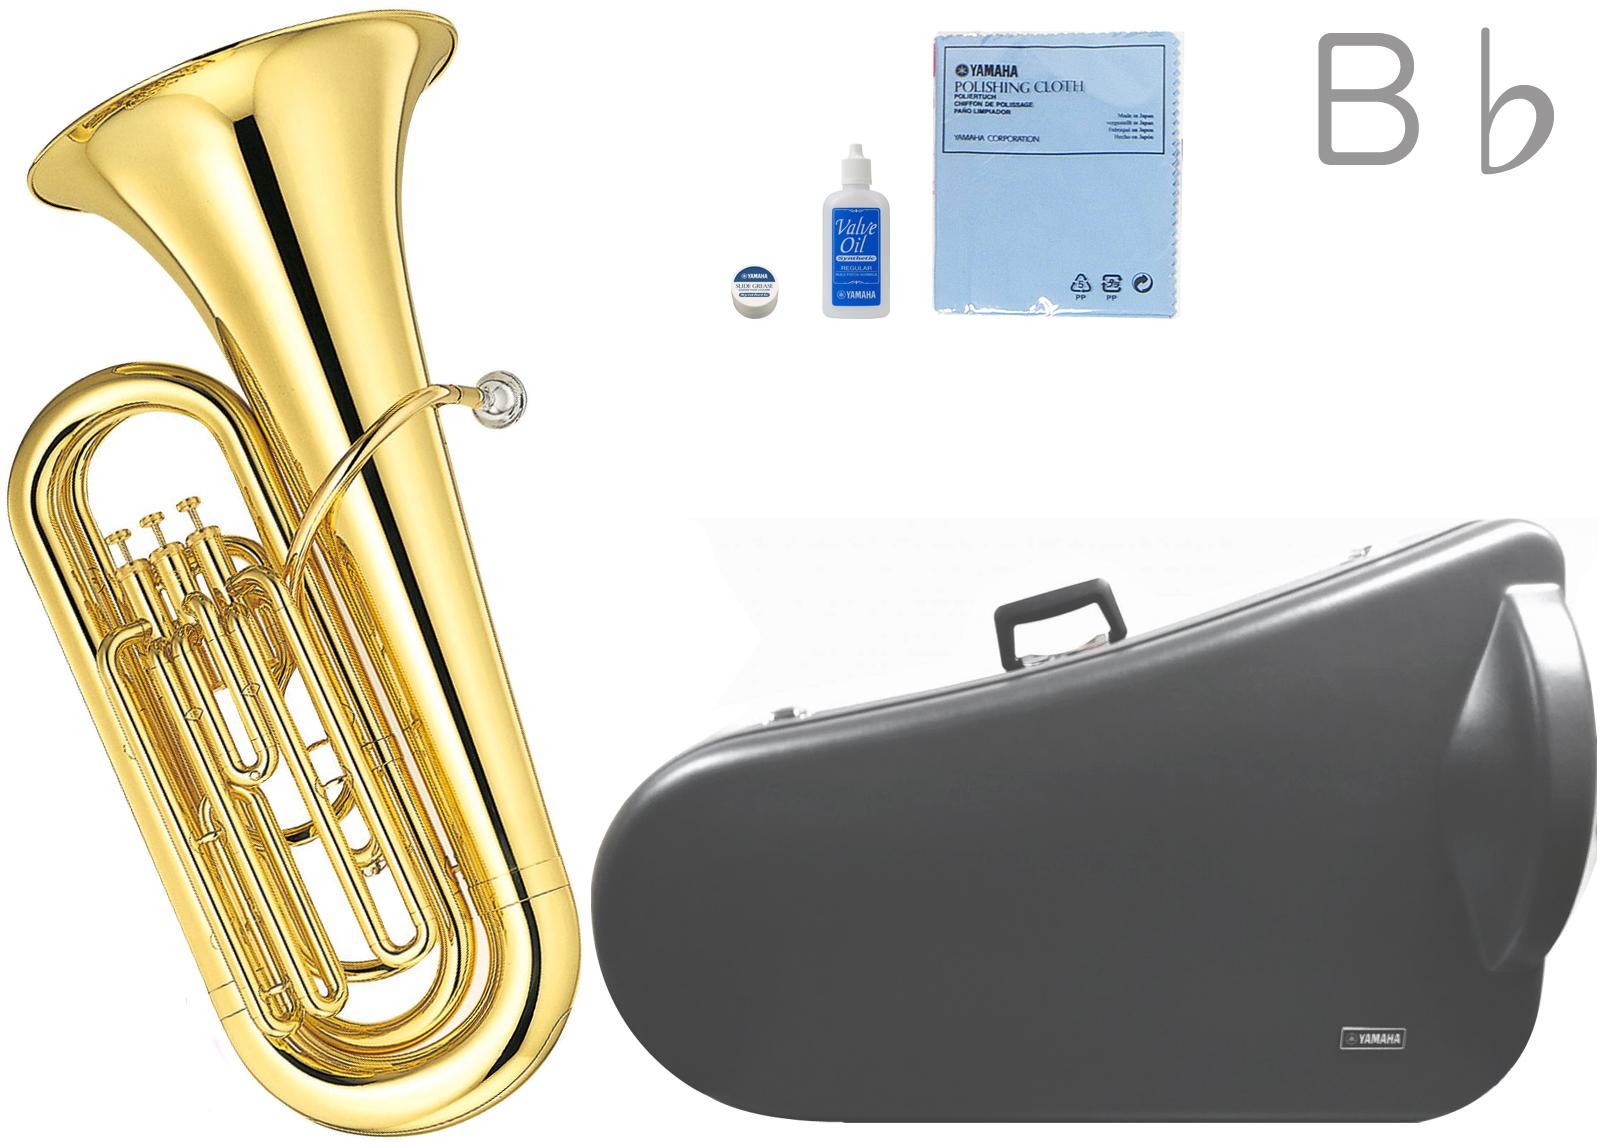 YAMAHA ( ヤマハ ) YBB-105 新品 B♭ チューバ 3ピストン 日本製 ゴールド 管体 トップアクション ピストンチューバ 管楽器 tuba 北海道 沖縄 離島不可